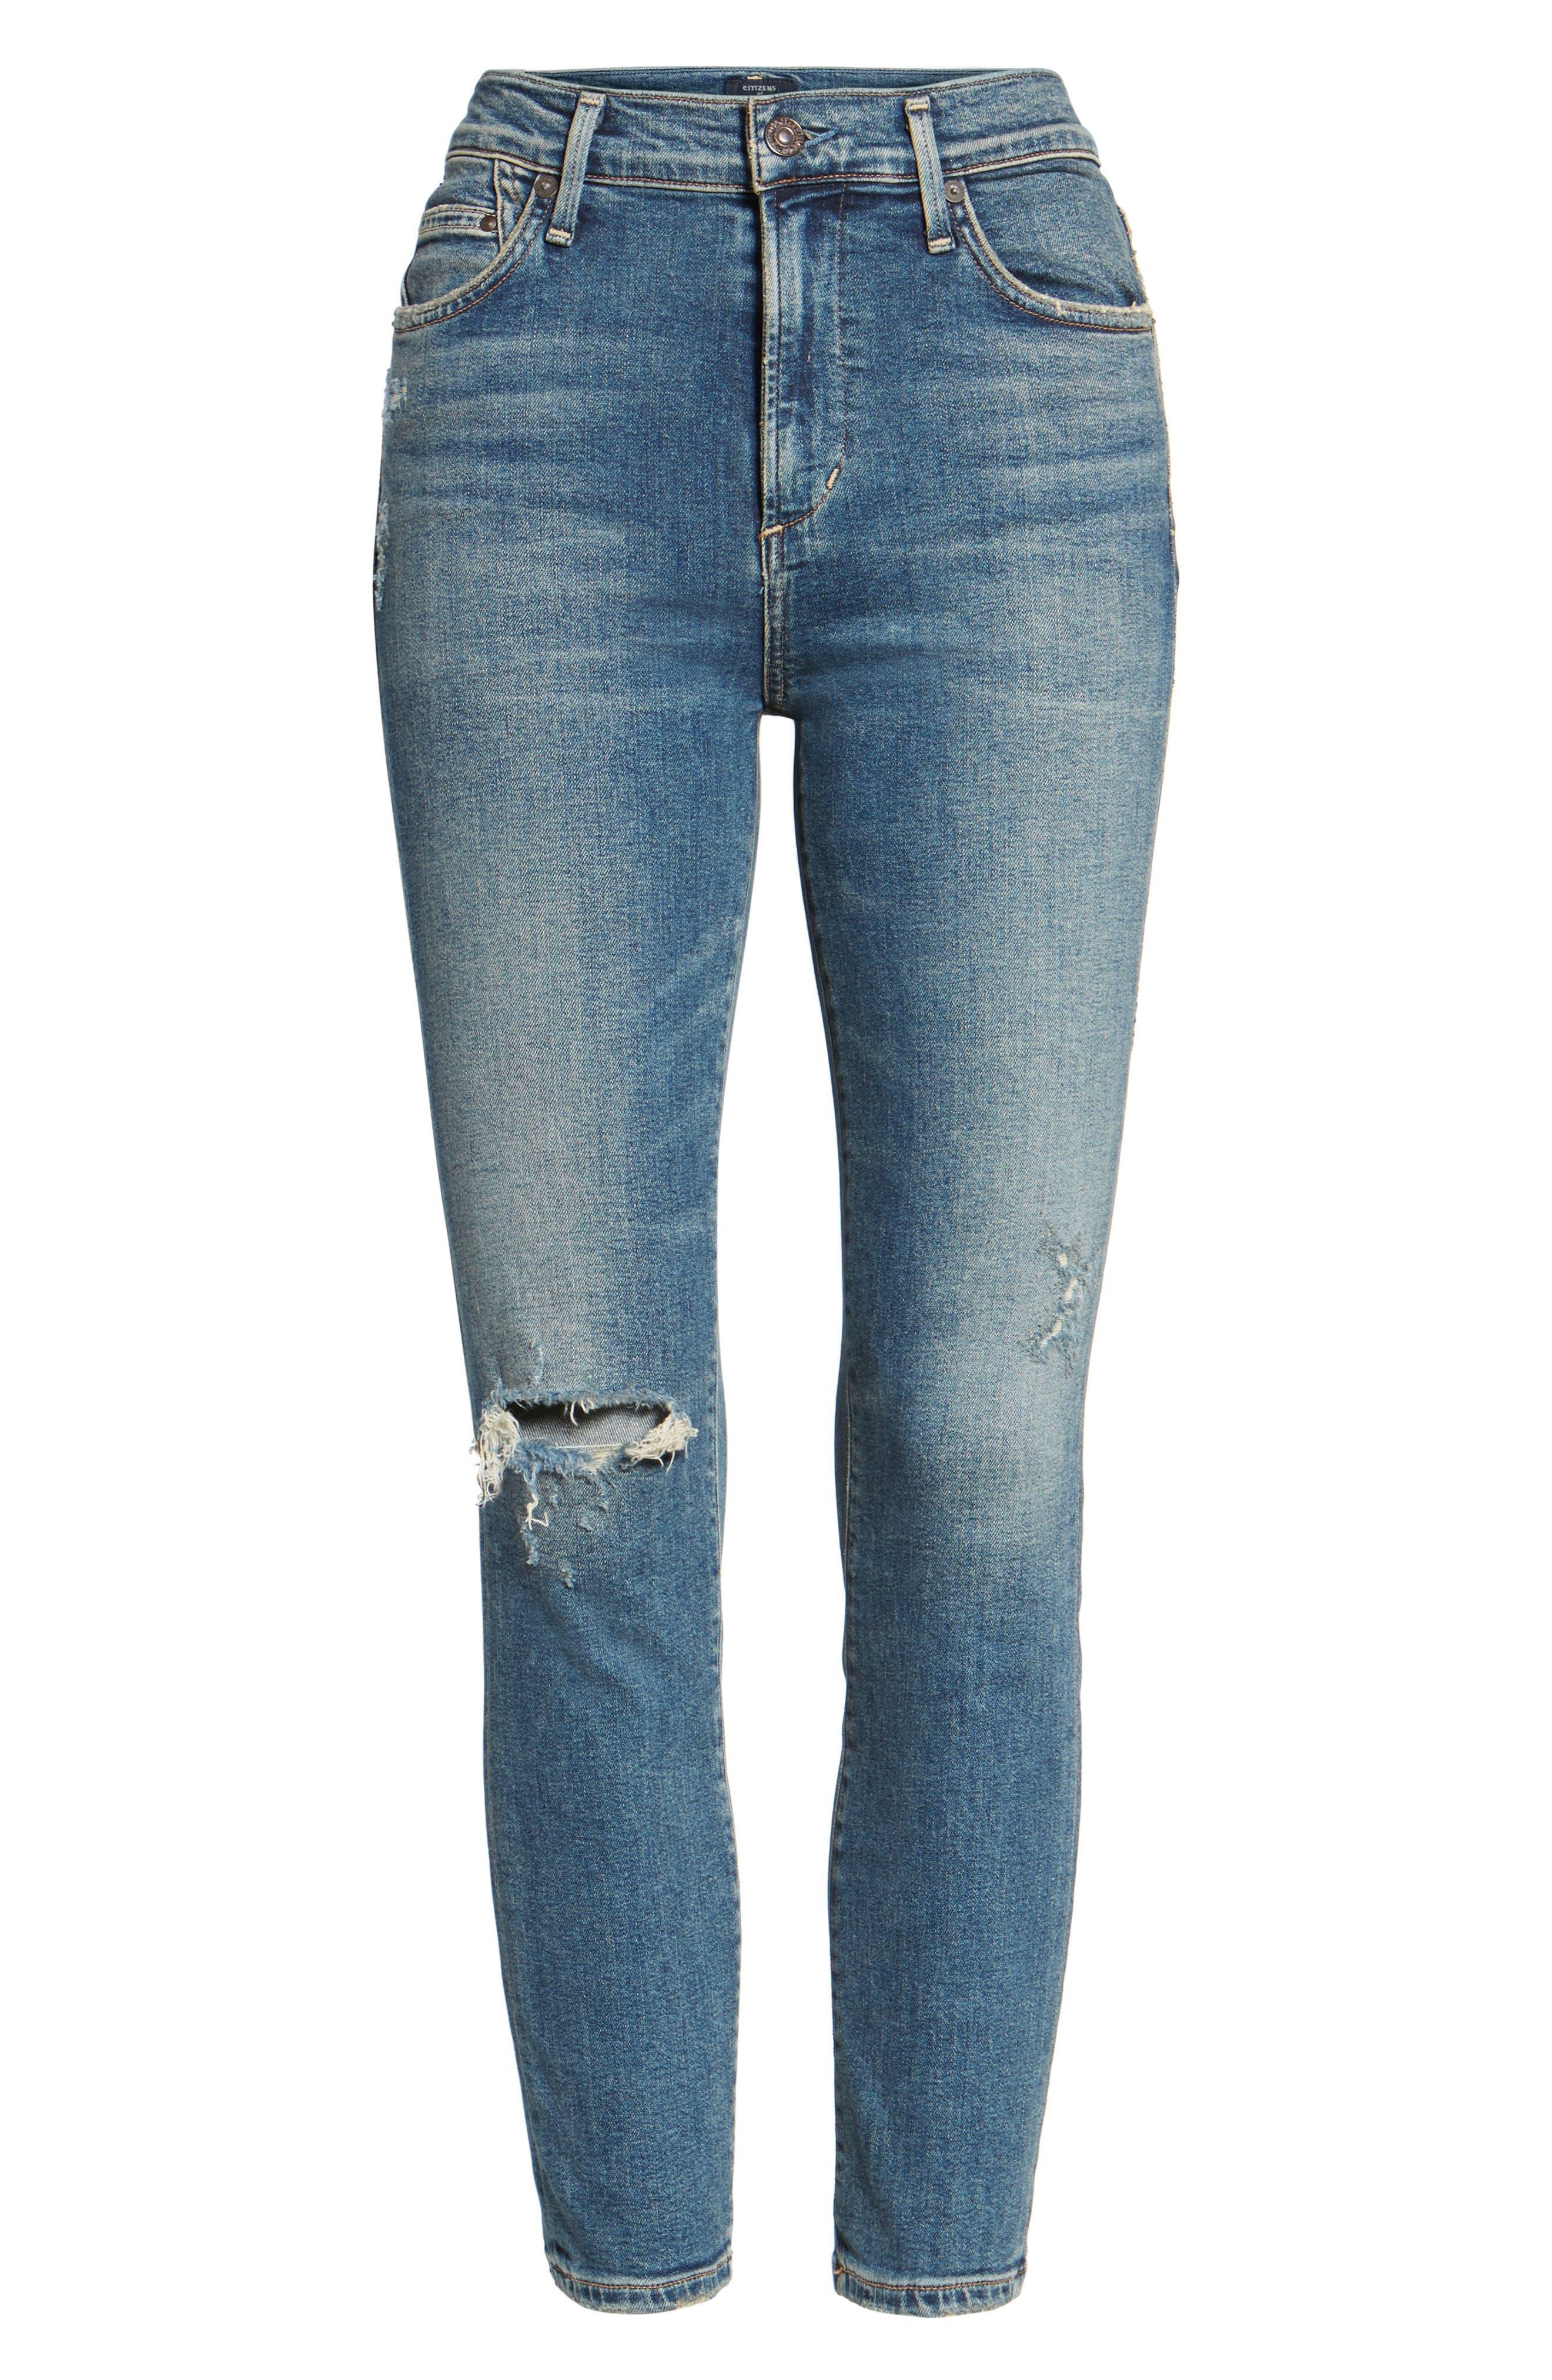 Rocket Crop Skinny Jeans,                             Alternate thumbnail 7, color,                             405